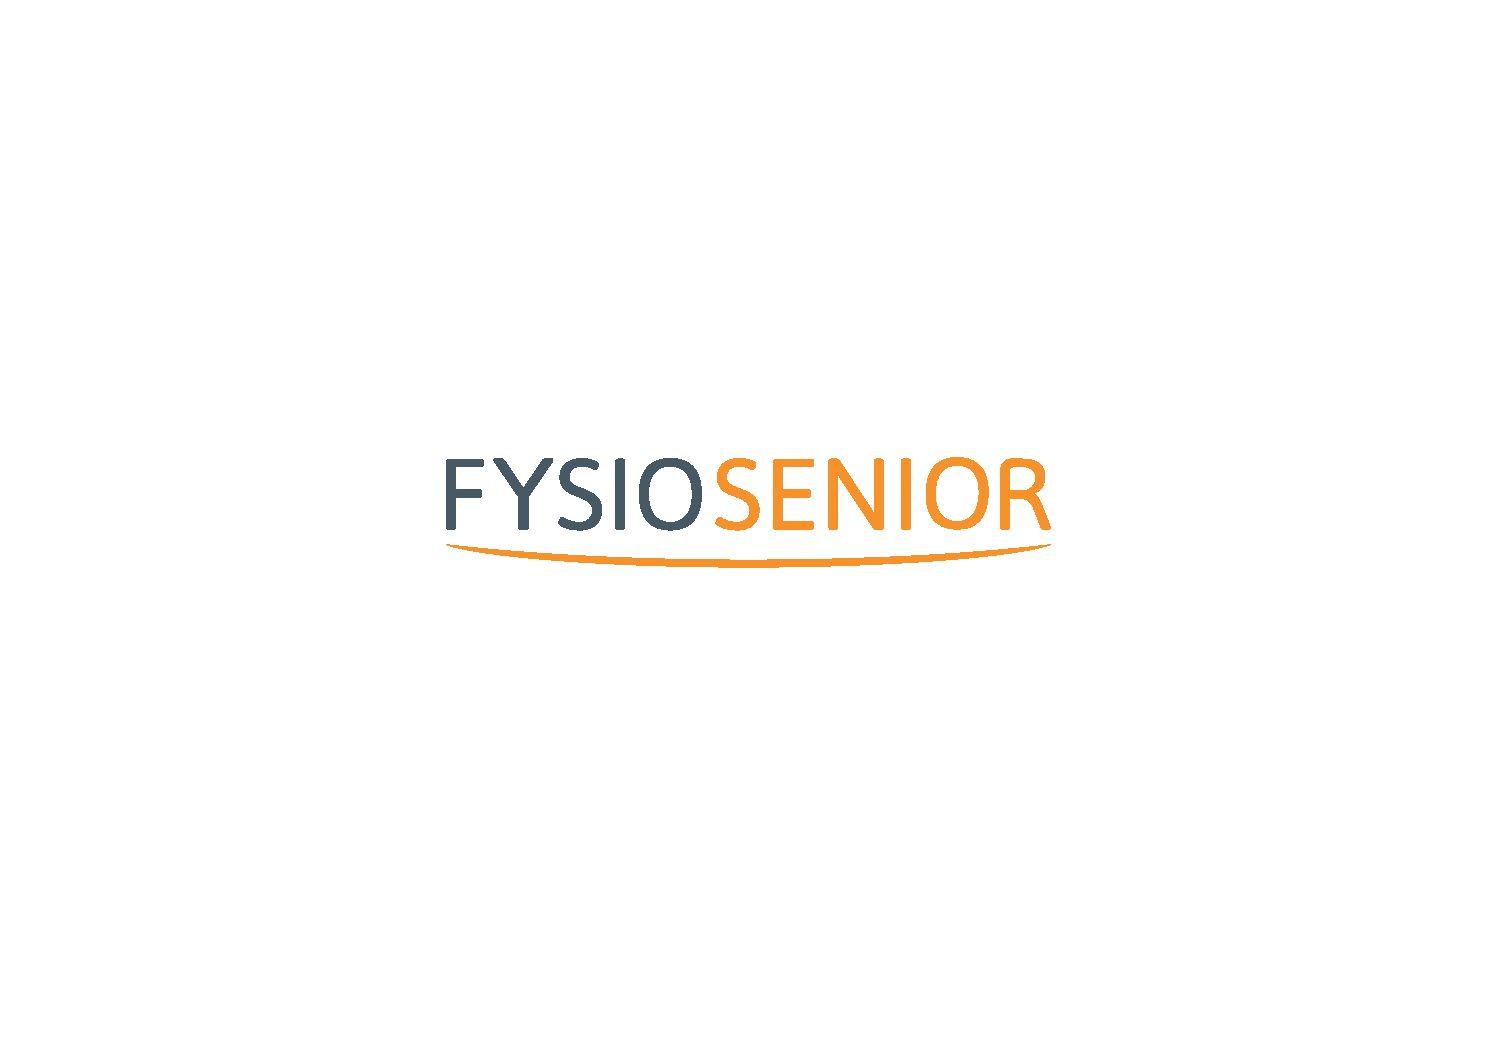 Fysiosenior